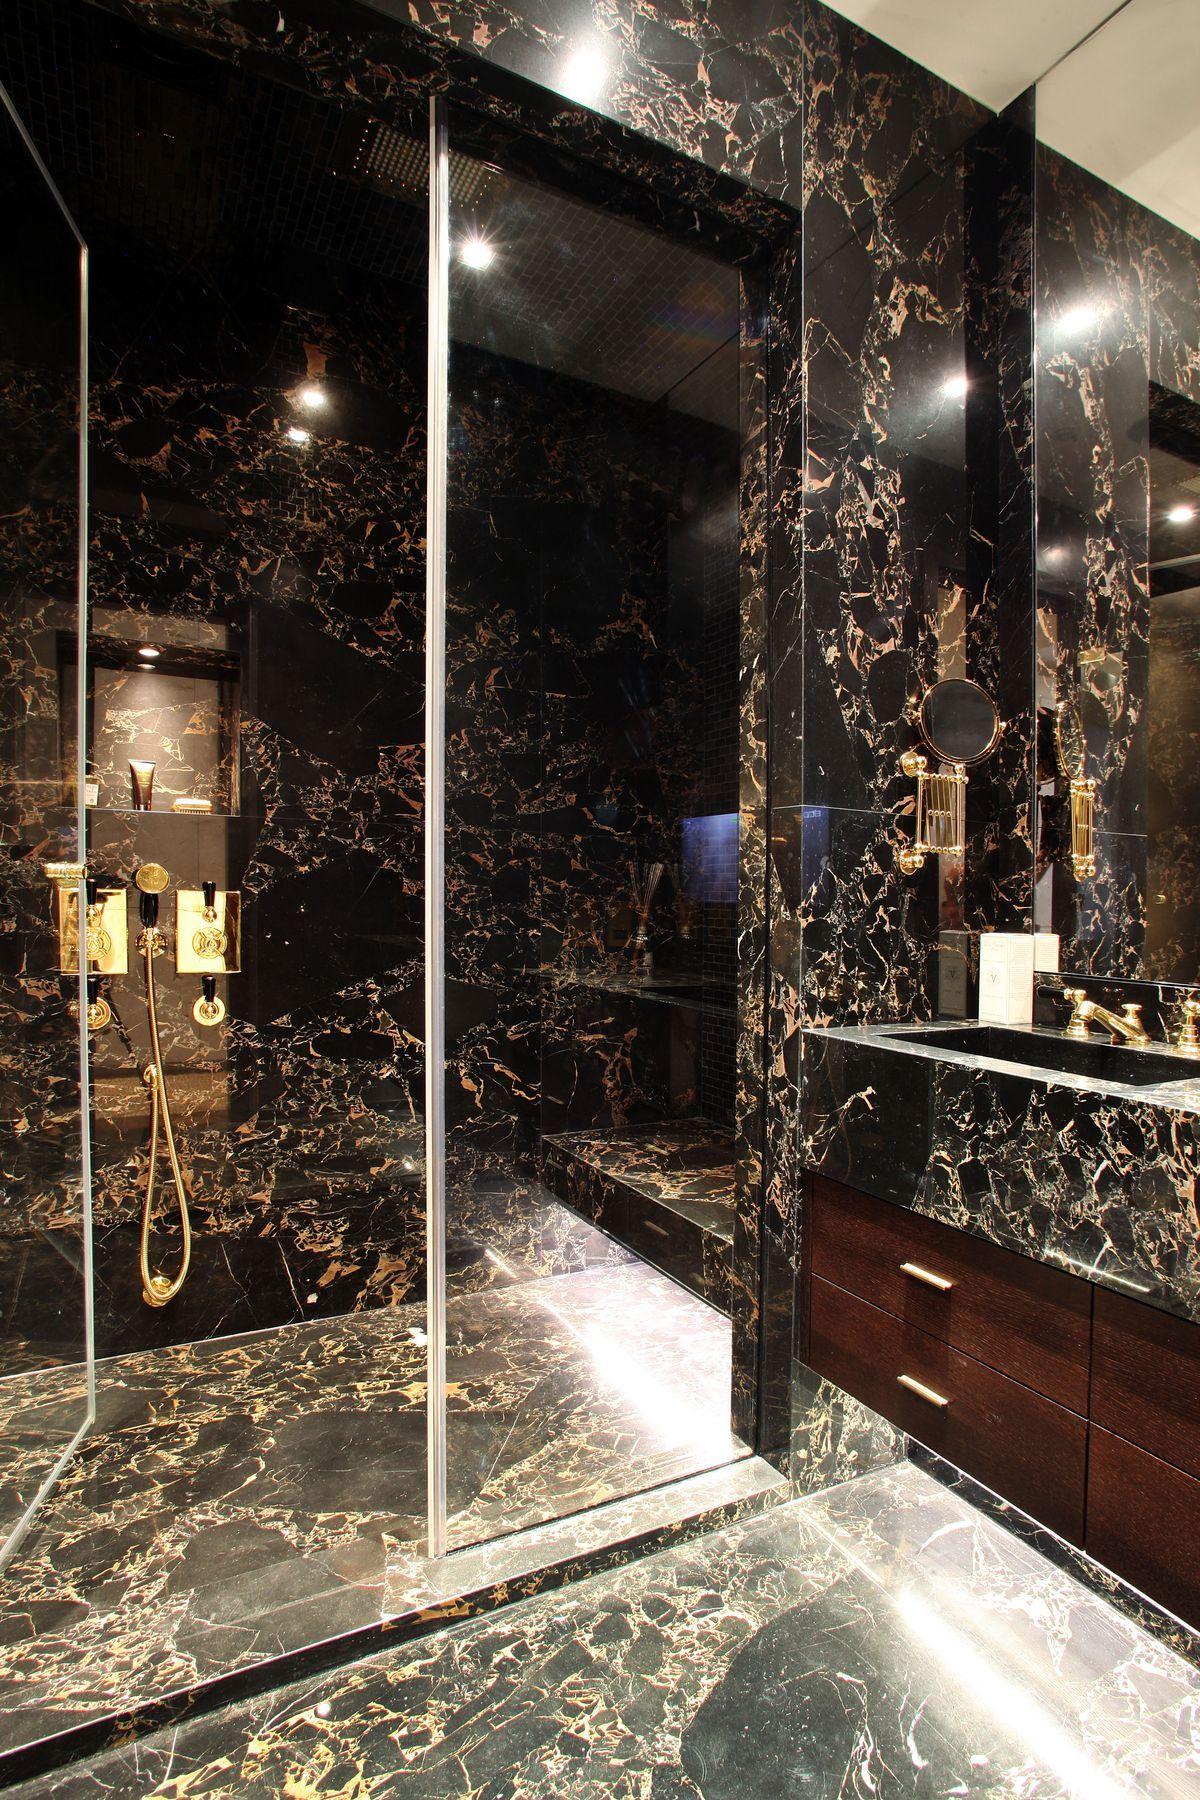 D4076fd445a629bb6122dbe196207aad Jpg 1 200 1 800 Pixels Bathroom Inspiration Modern Bathroom Design Luxury Masculine Bathroom